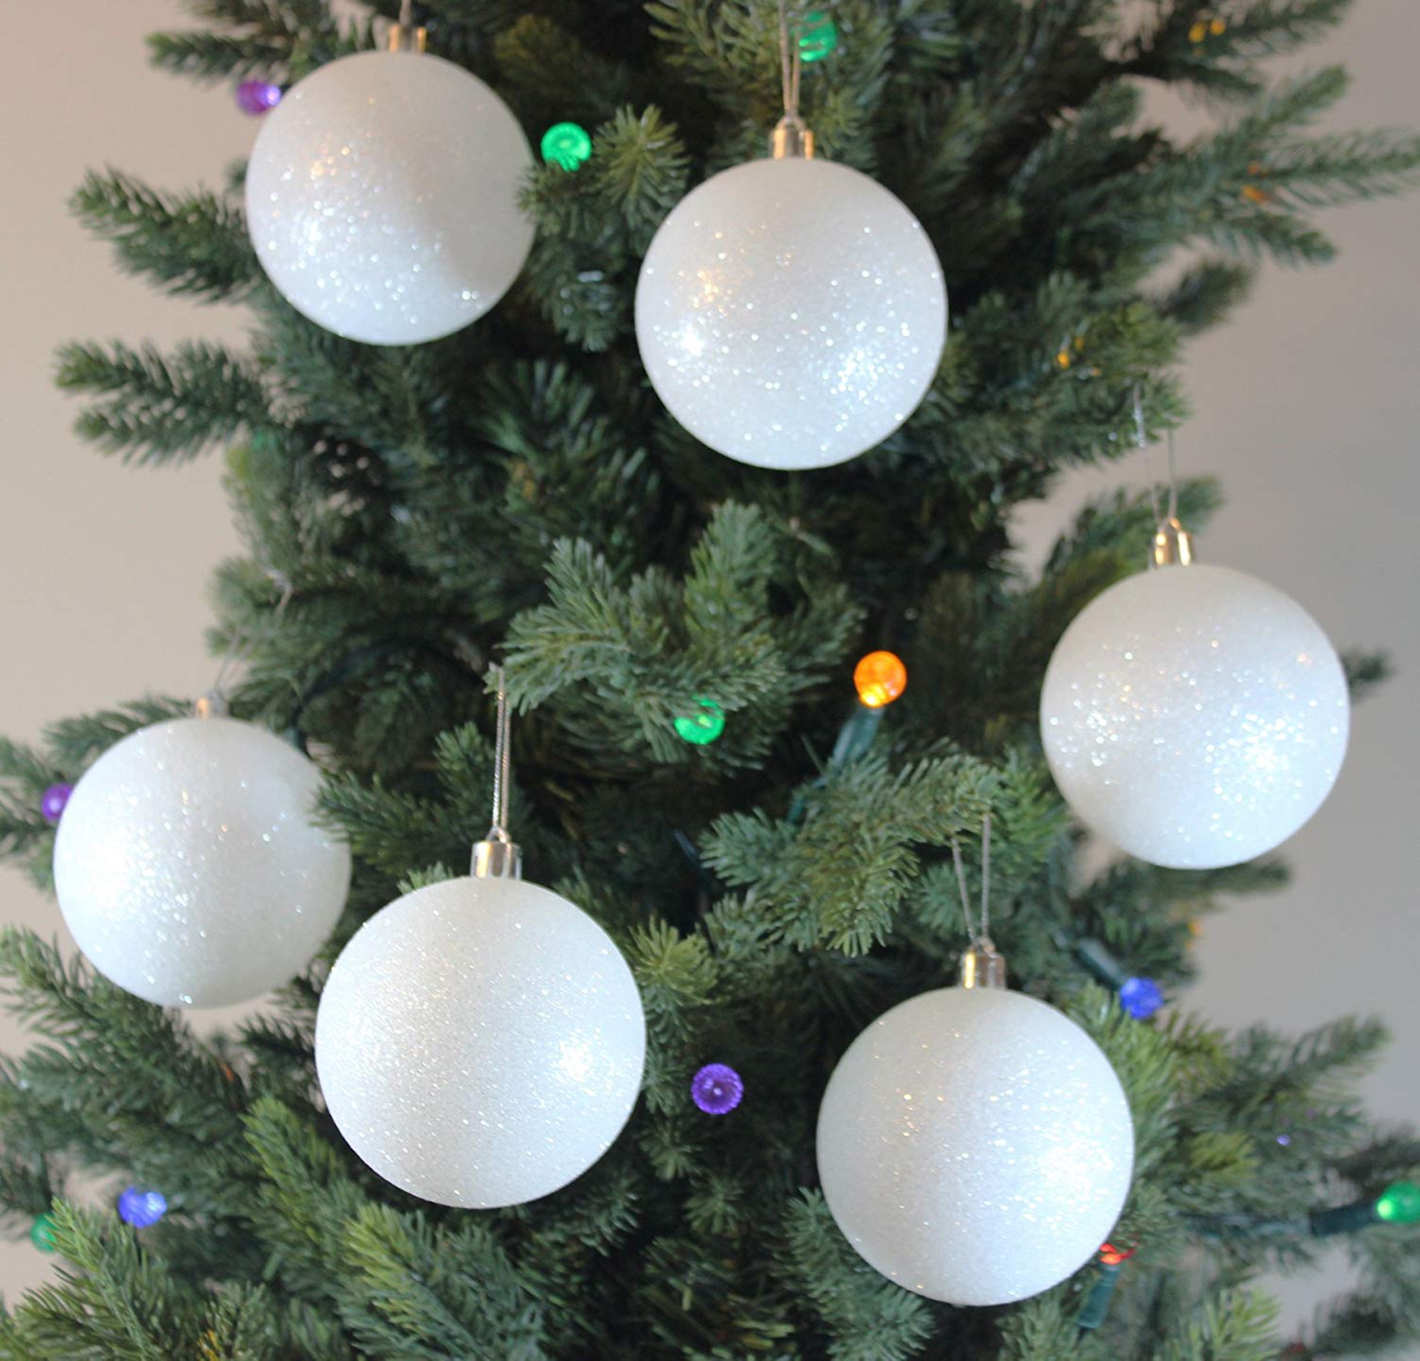 Festive Season 12 Pack 80mm White Snowball Christmas Tree Ball Ornaments